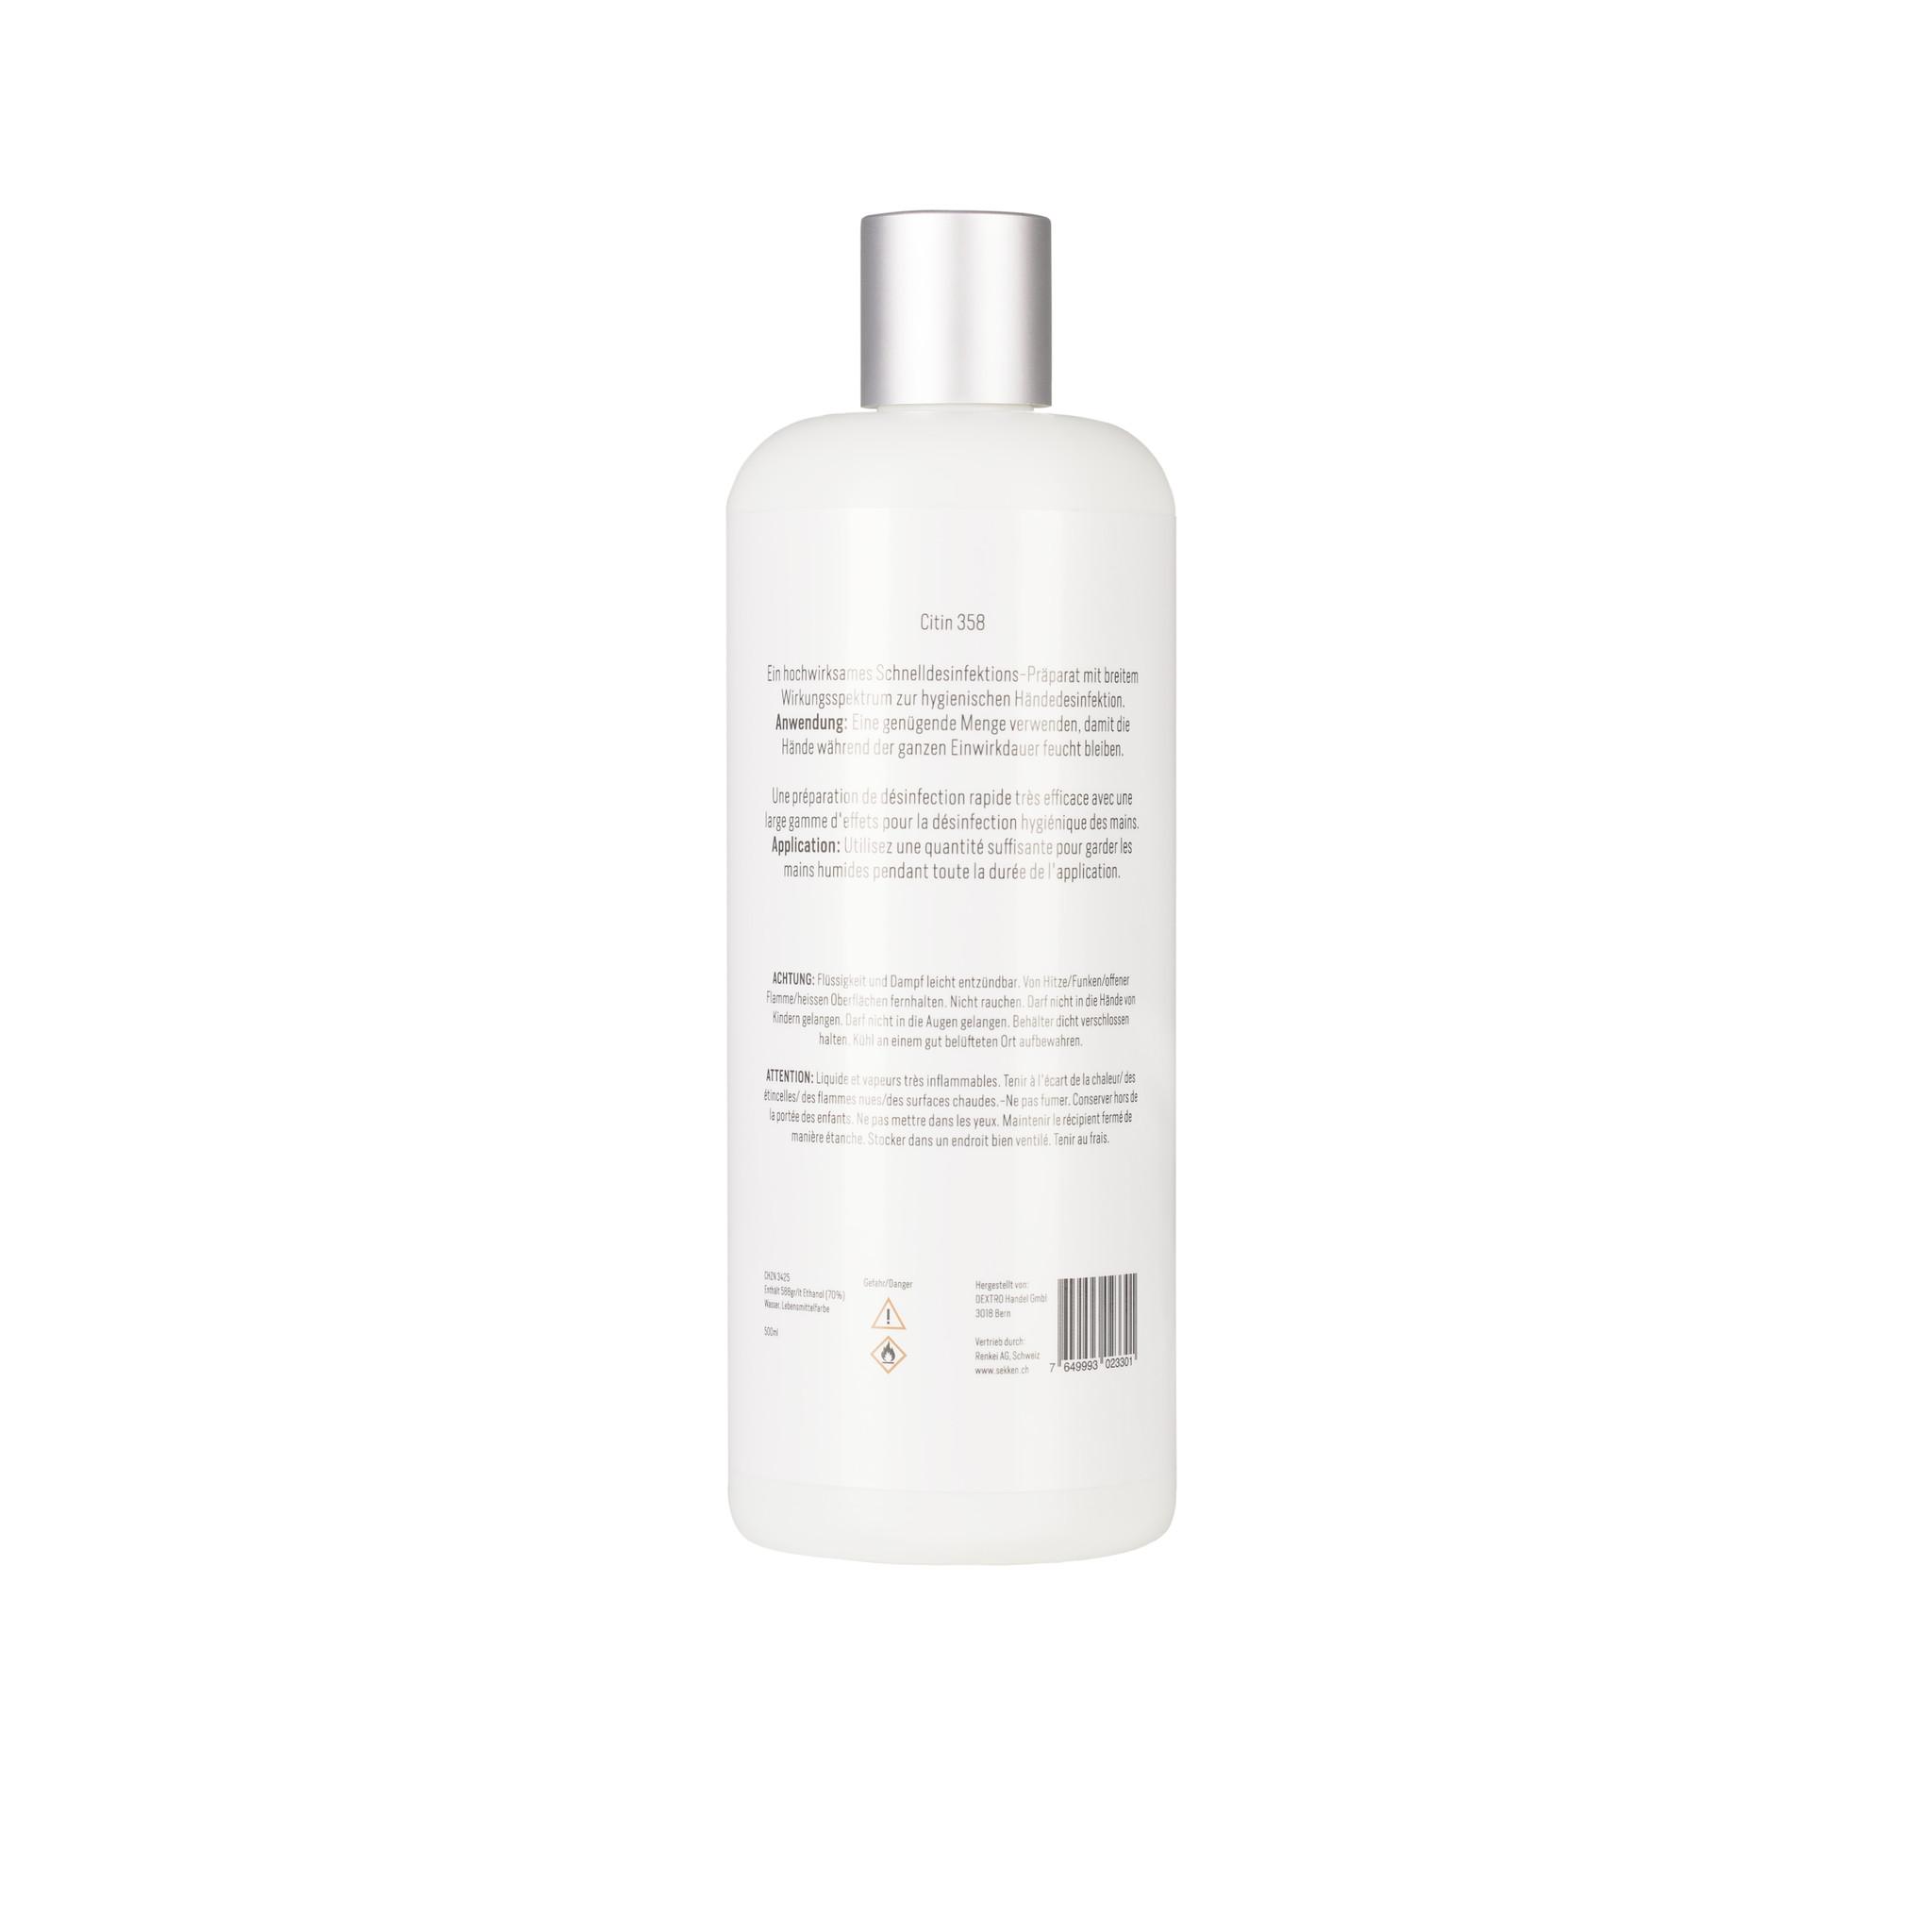 B2B Hand Sanitizer Citin 358 500ml over 48 pcs - Copy-2